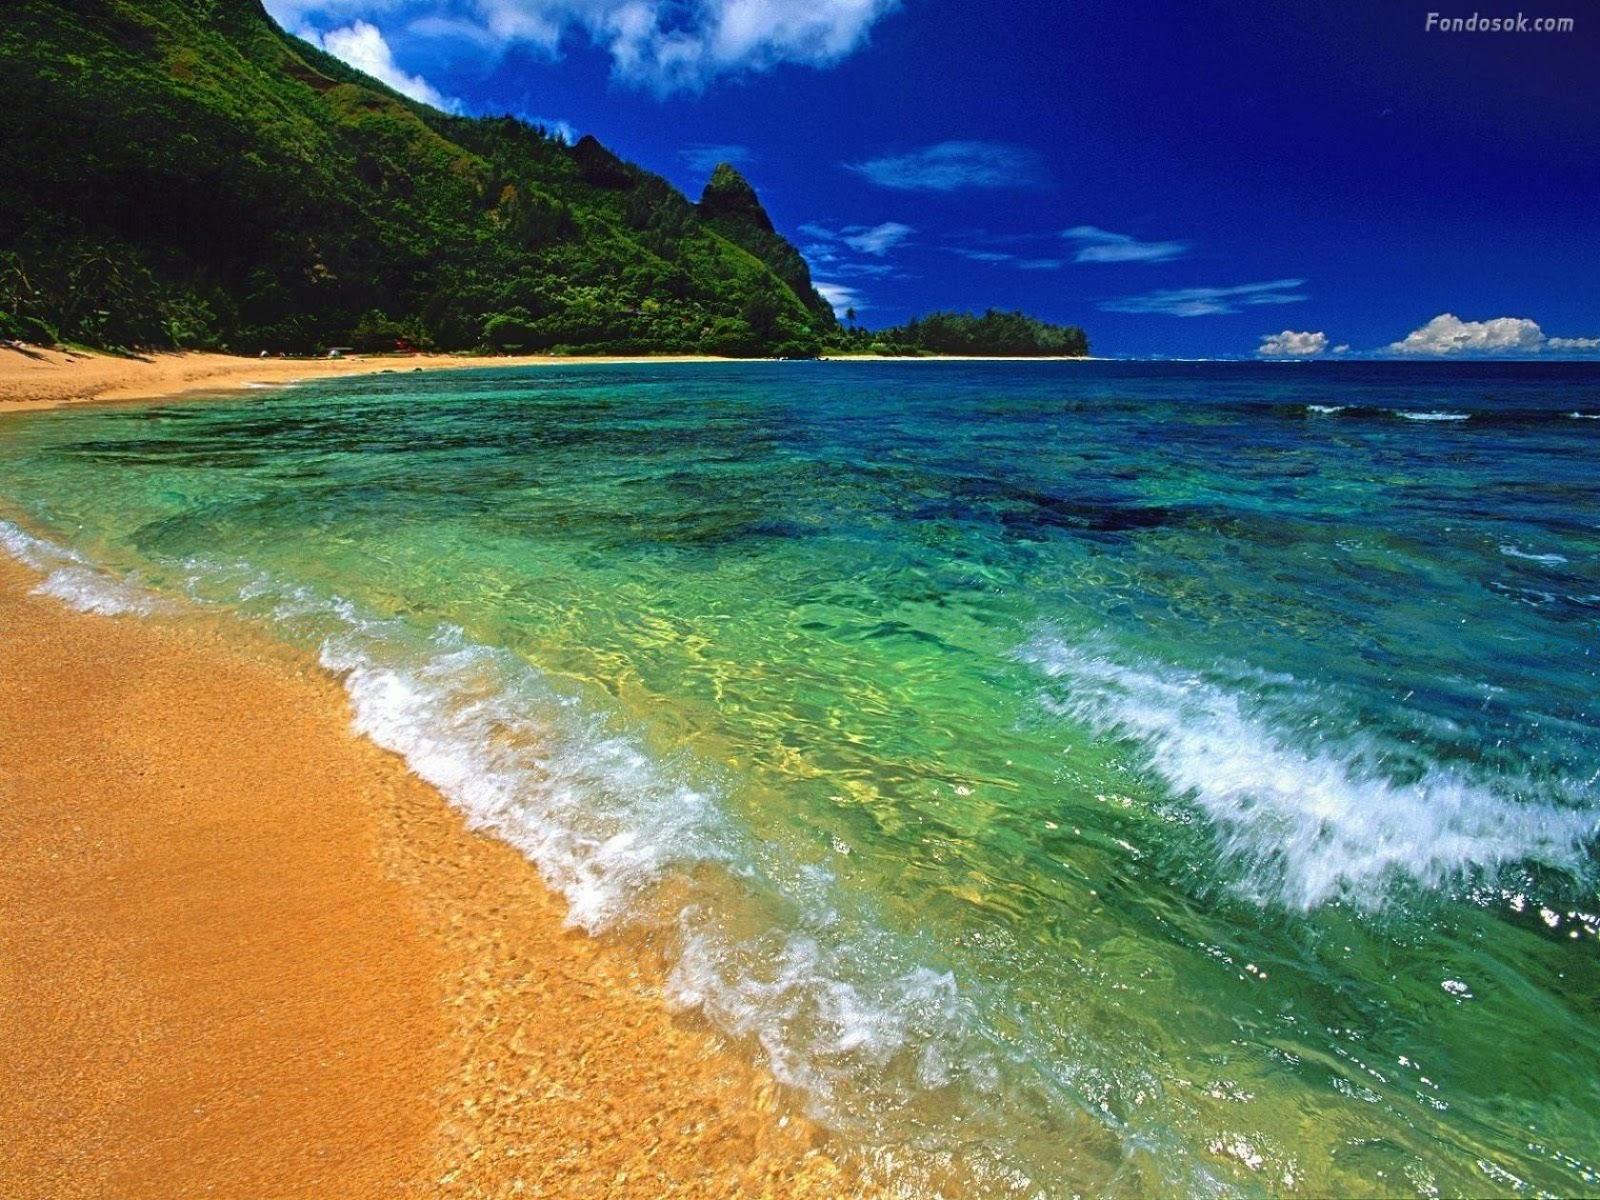 Hd wallpaper hd beach wallpapers 1080p - Beach hd wallpapers 1080p ...